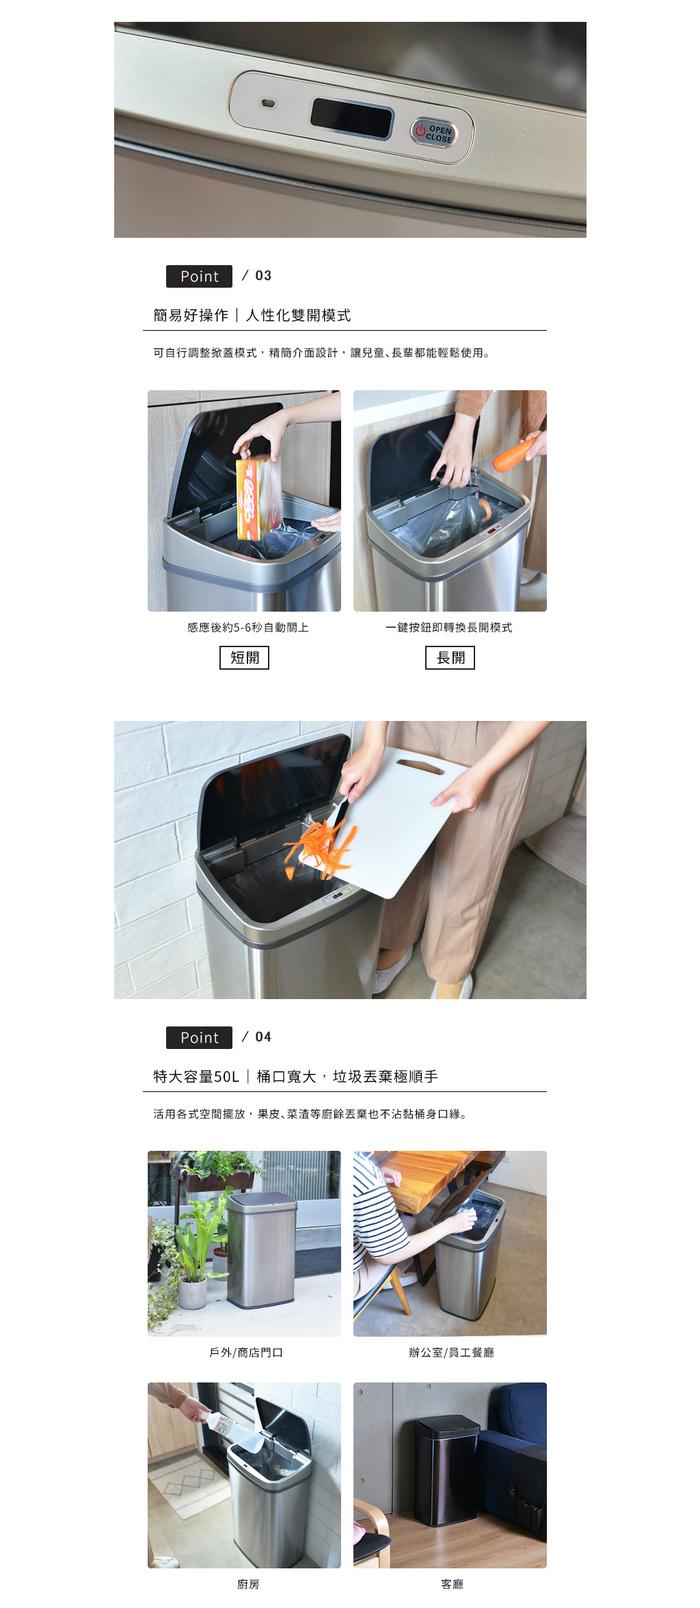 +O家窩|日式特大希利自動感應不鏽鋼垃圾桶50L